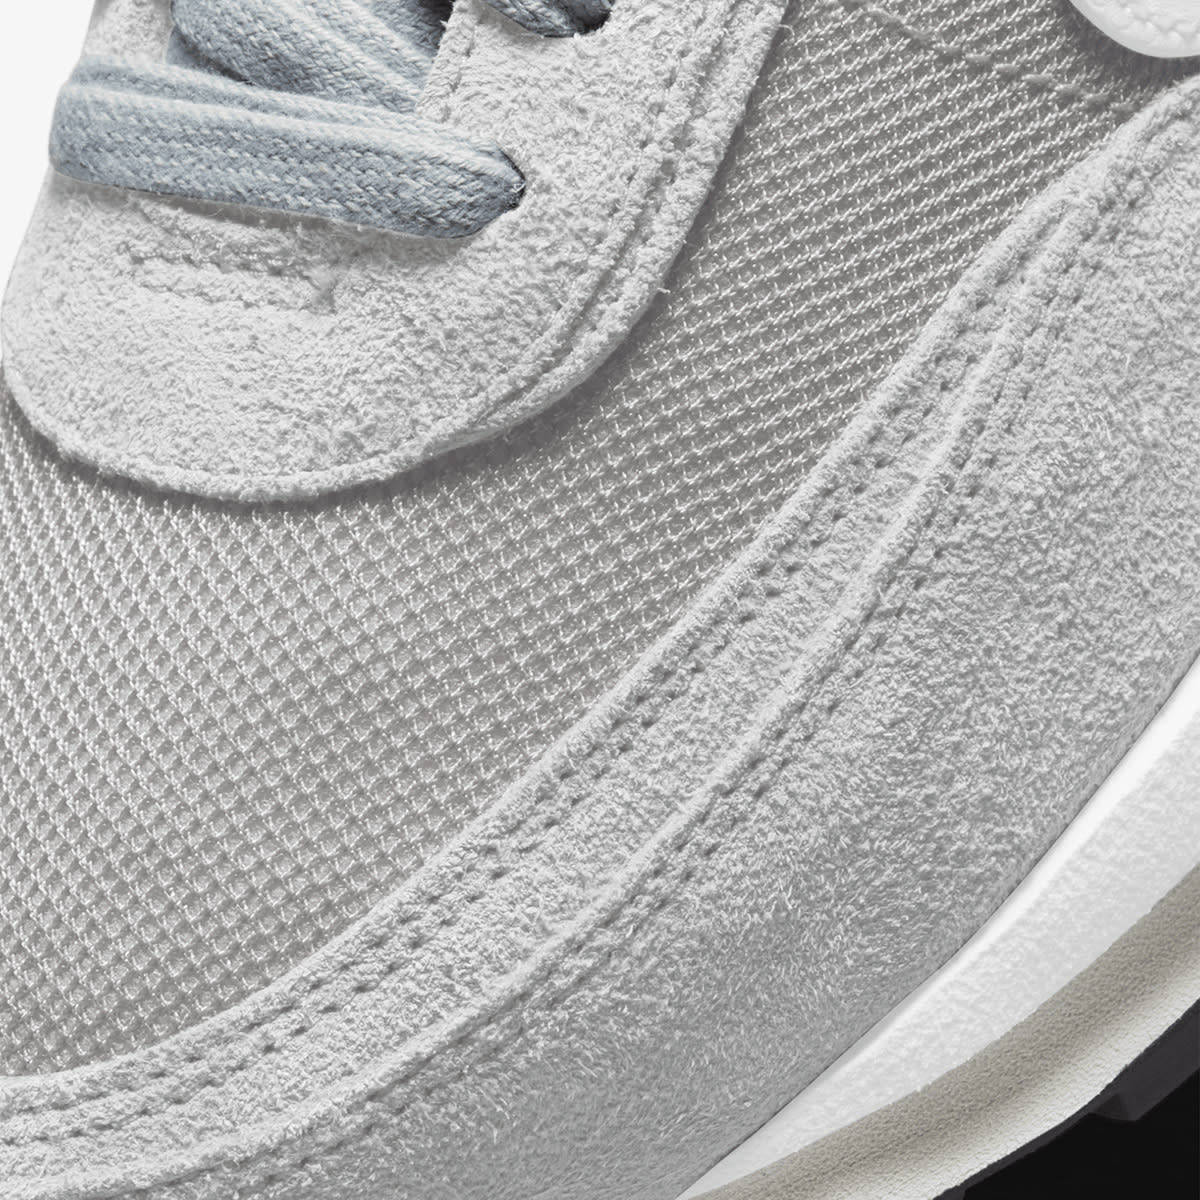 Nike x Sacai x Fragment LDWaffle - DH2684-001